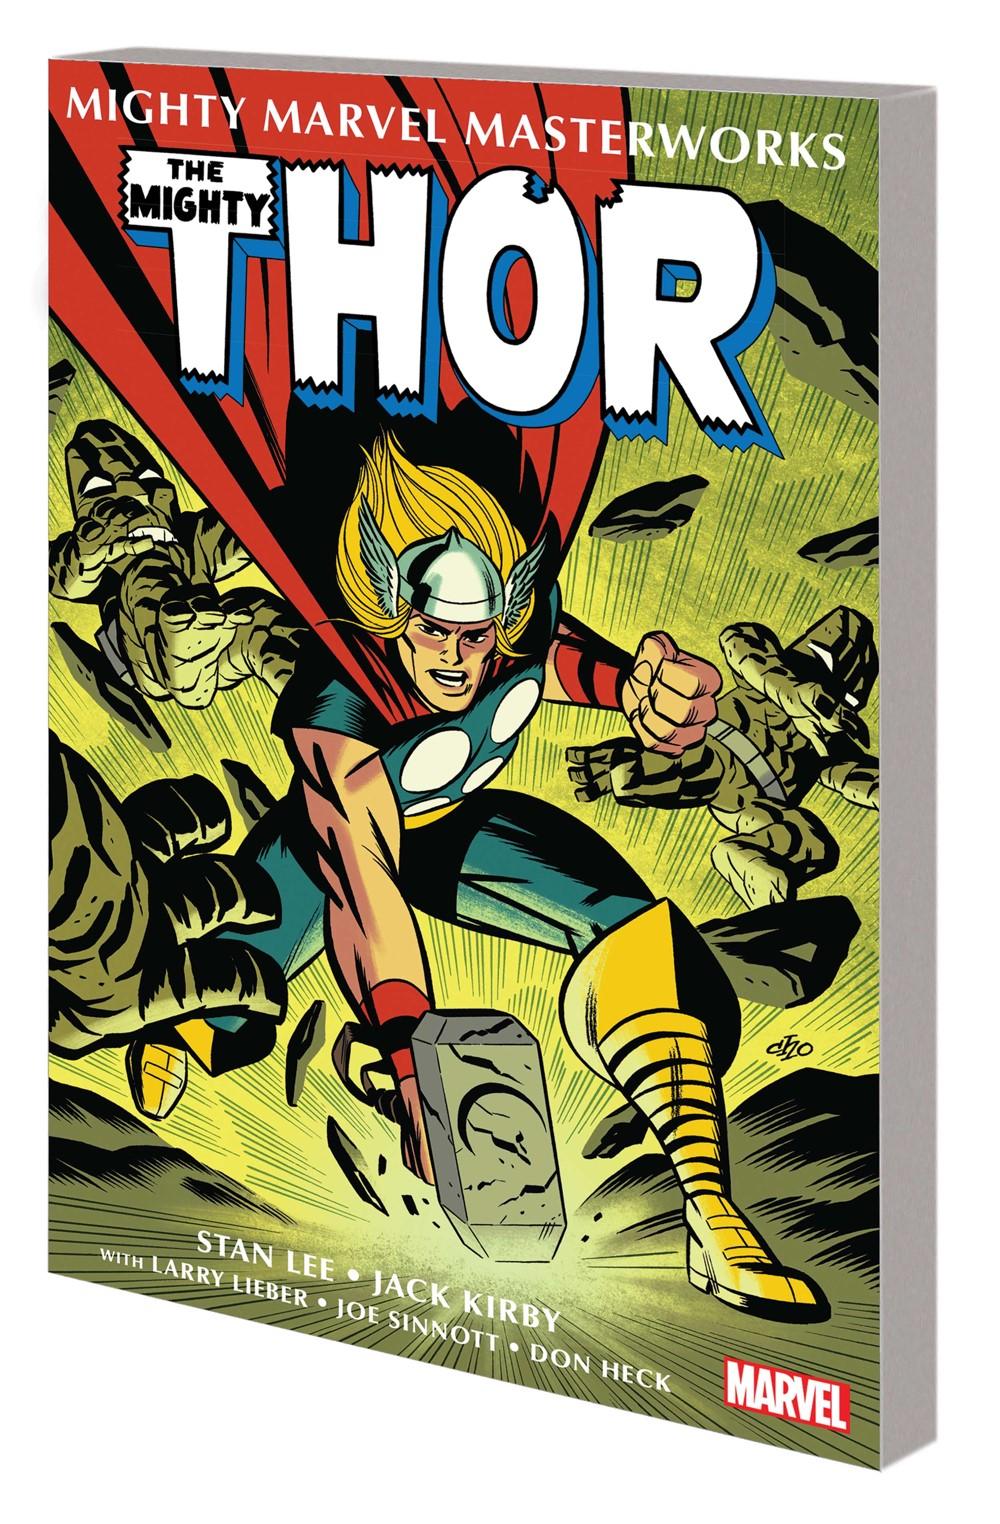 MMTHOR001_GN_TPB_CHO Marvel Comics September 2021 Solicitations